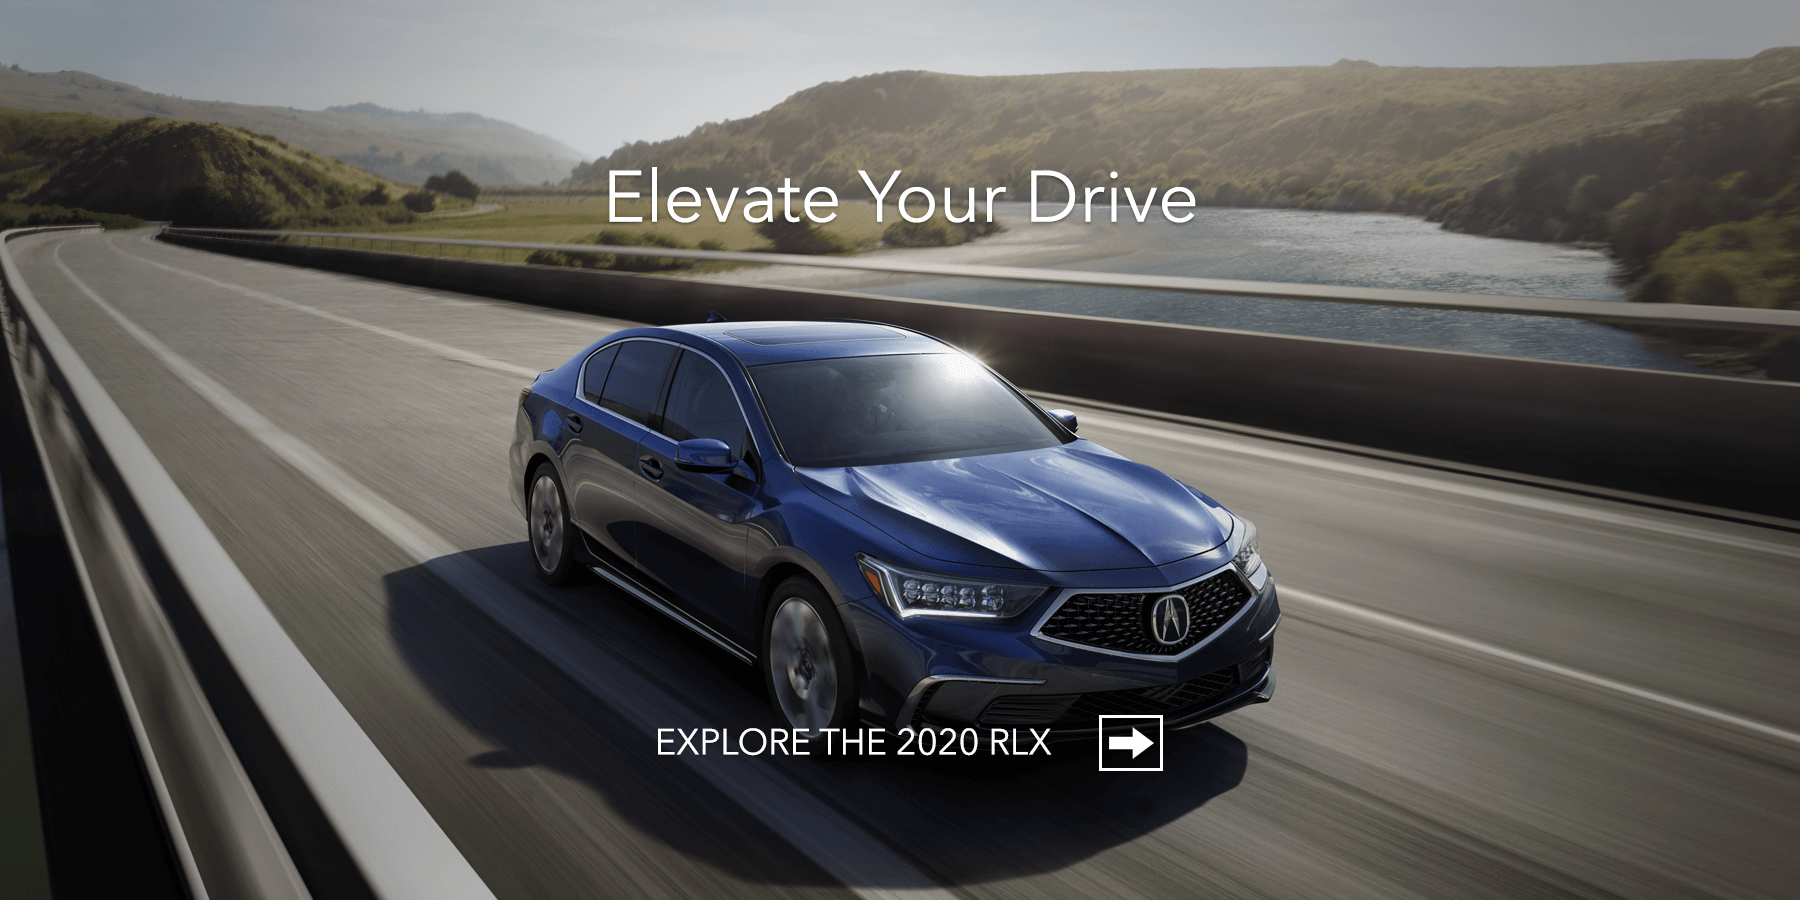 2020 Acura RLX Fathom Blue Pearl Front Angle HP Slide